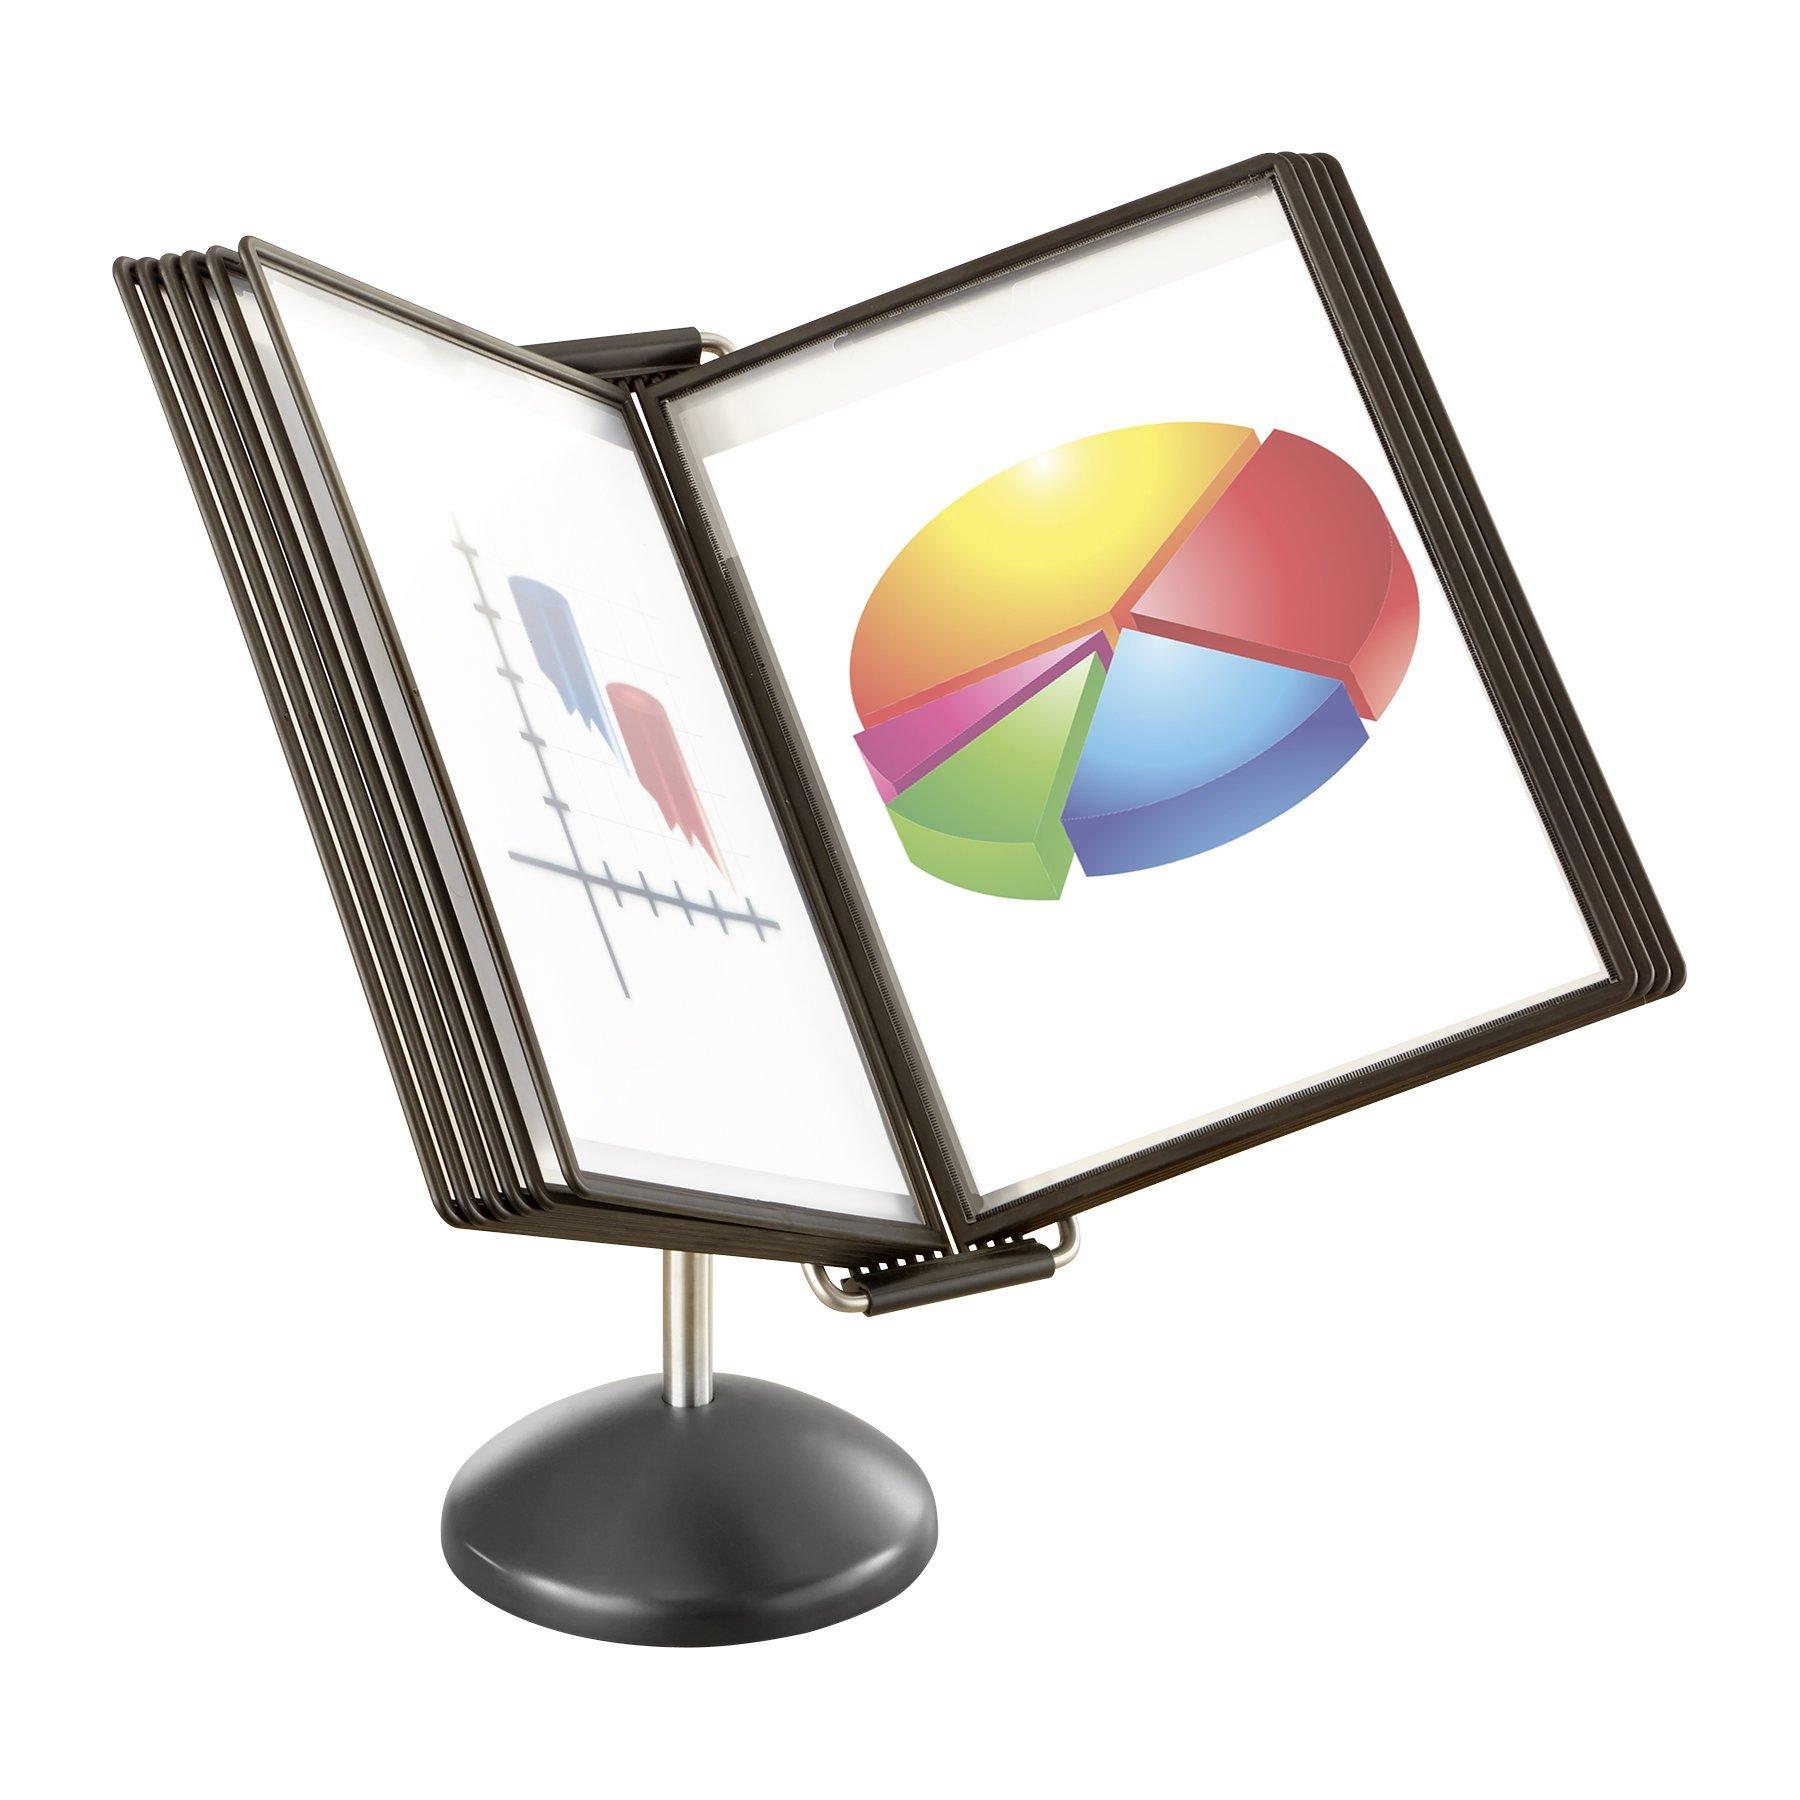 Safco Ultimate Desktop Reference, 20 1/4'' x 18 1/4'' x 14 1/2''